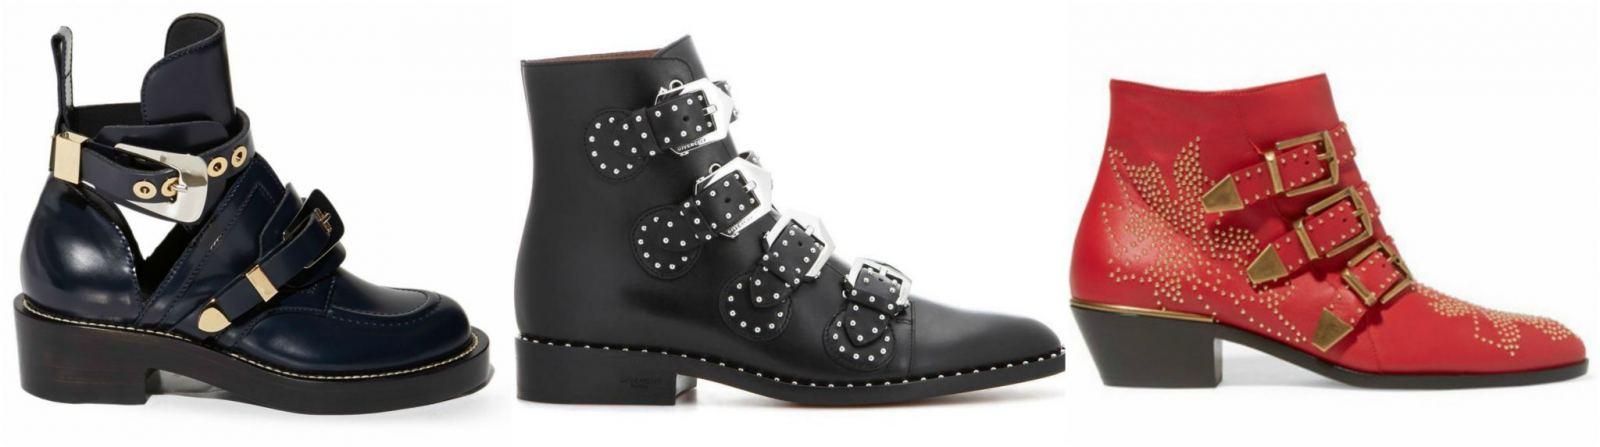 927dee7cae6 Top 10 Winter 'It' Boots: Real vs. Steal - Fleur De Force